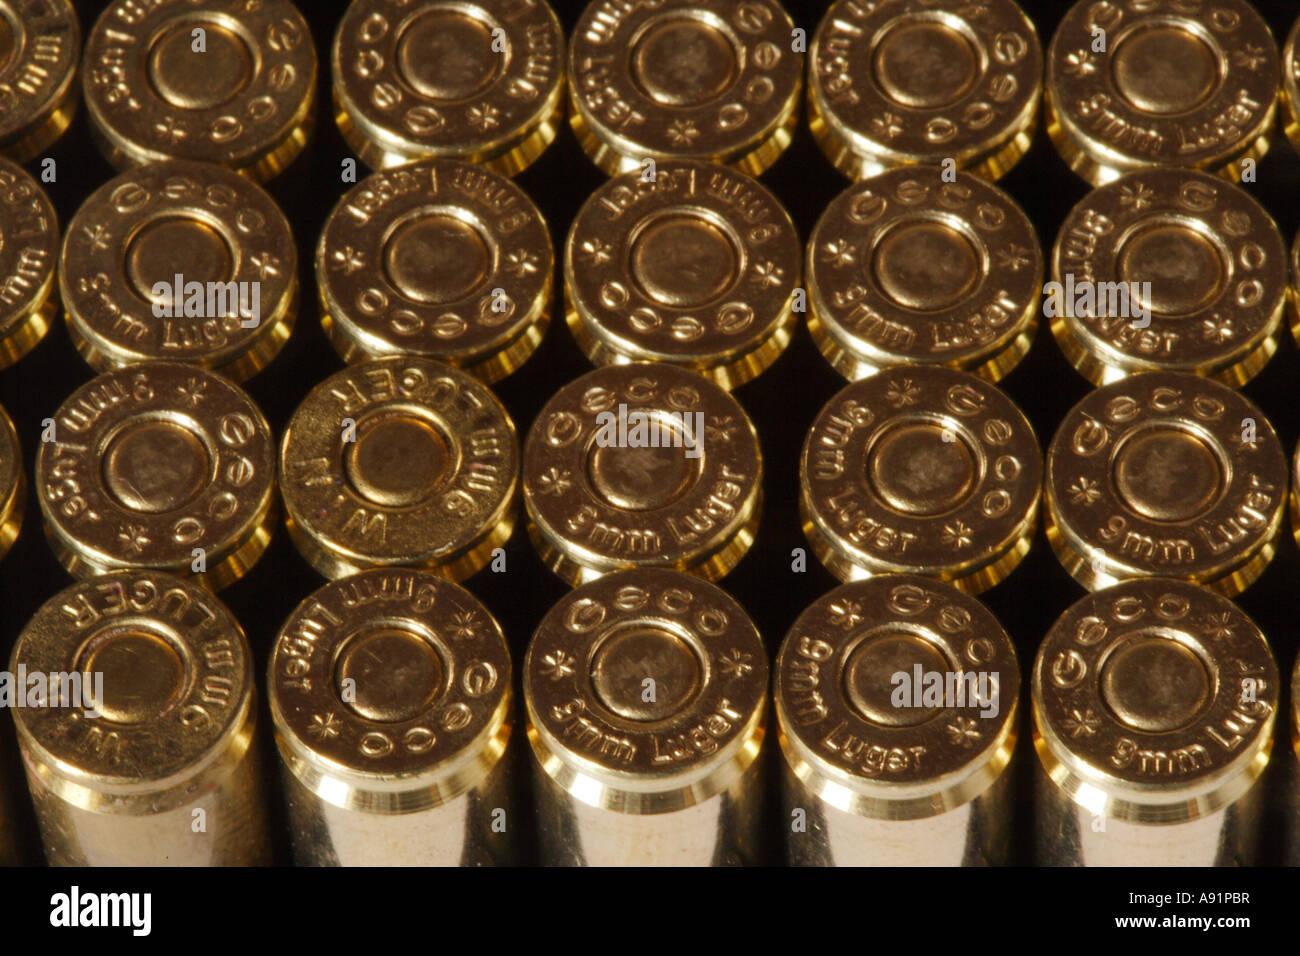 Pistol ammunition 9mm Luger Stock Photo: 12222250 - Alamy